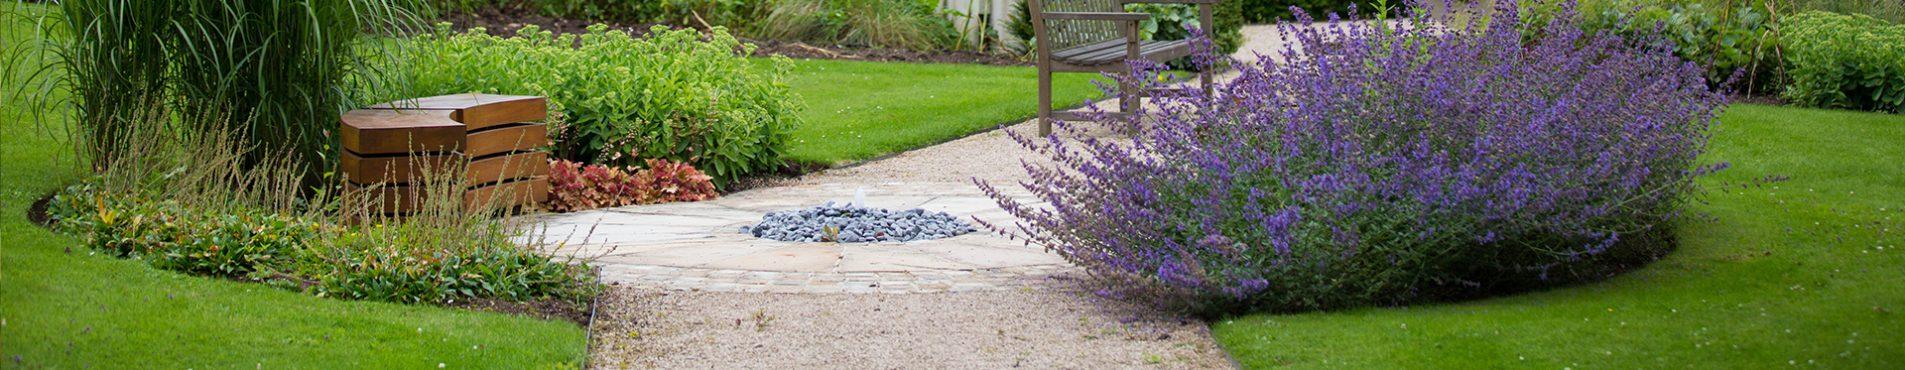 Longfield garden lavender plant